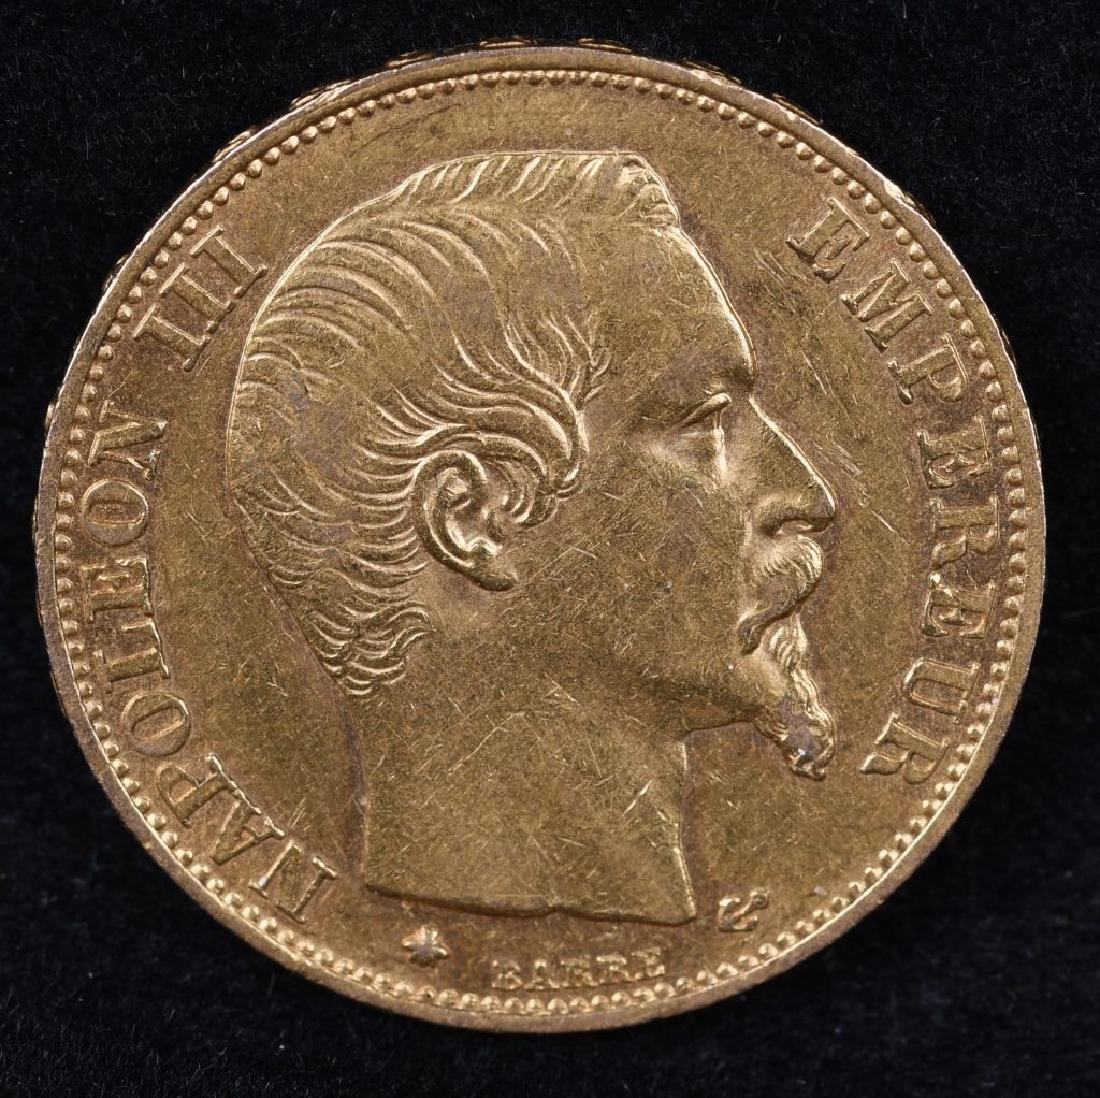 1859 20 FRANC